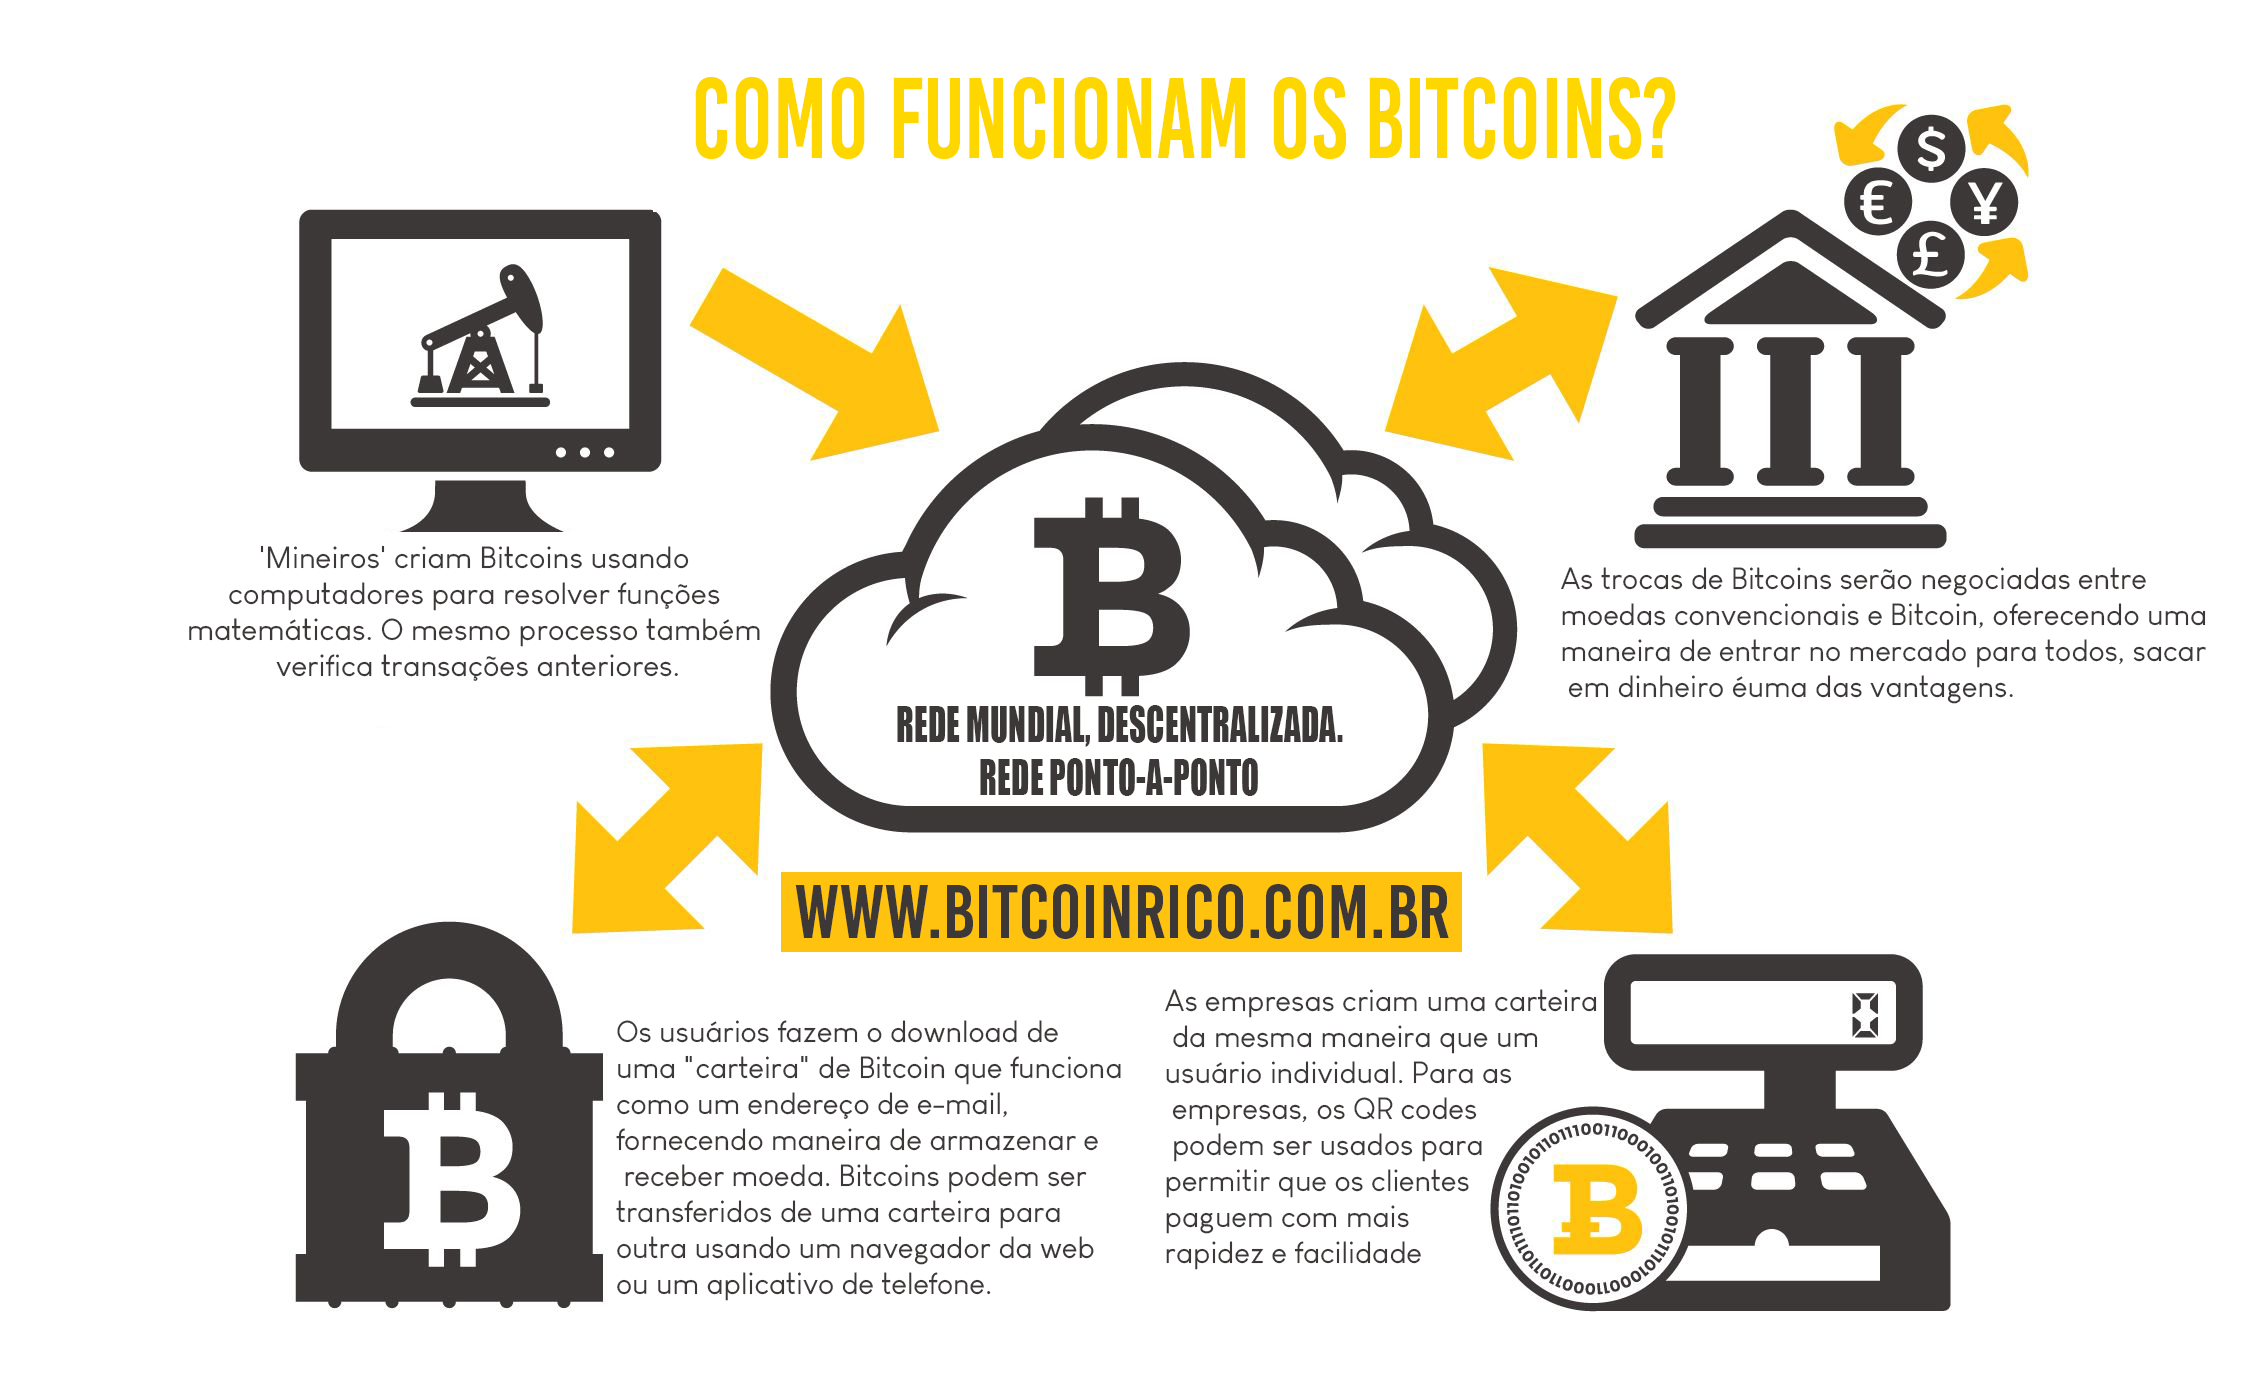 como funcionam os bitcoins bitcoin bitcoinbrasil on wall street bets logo id=42164